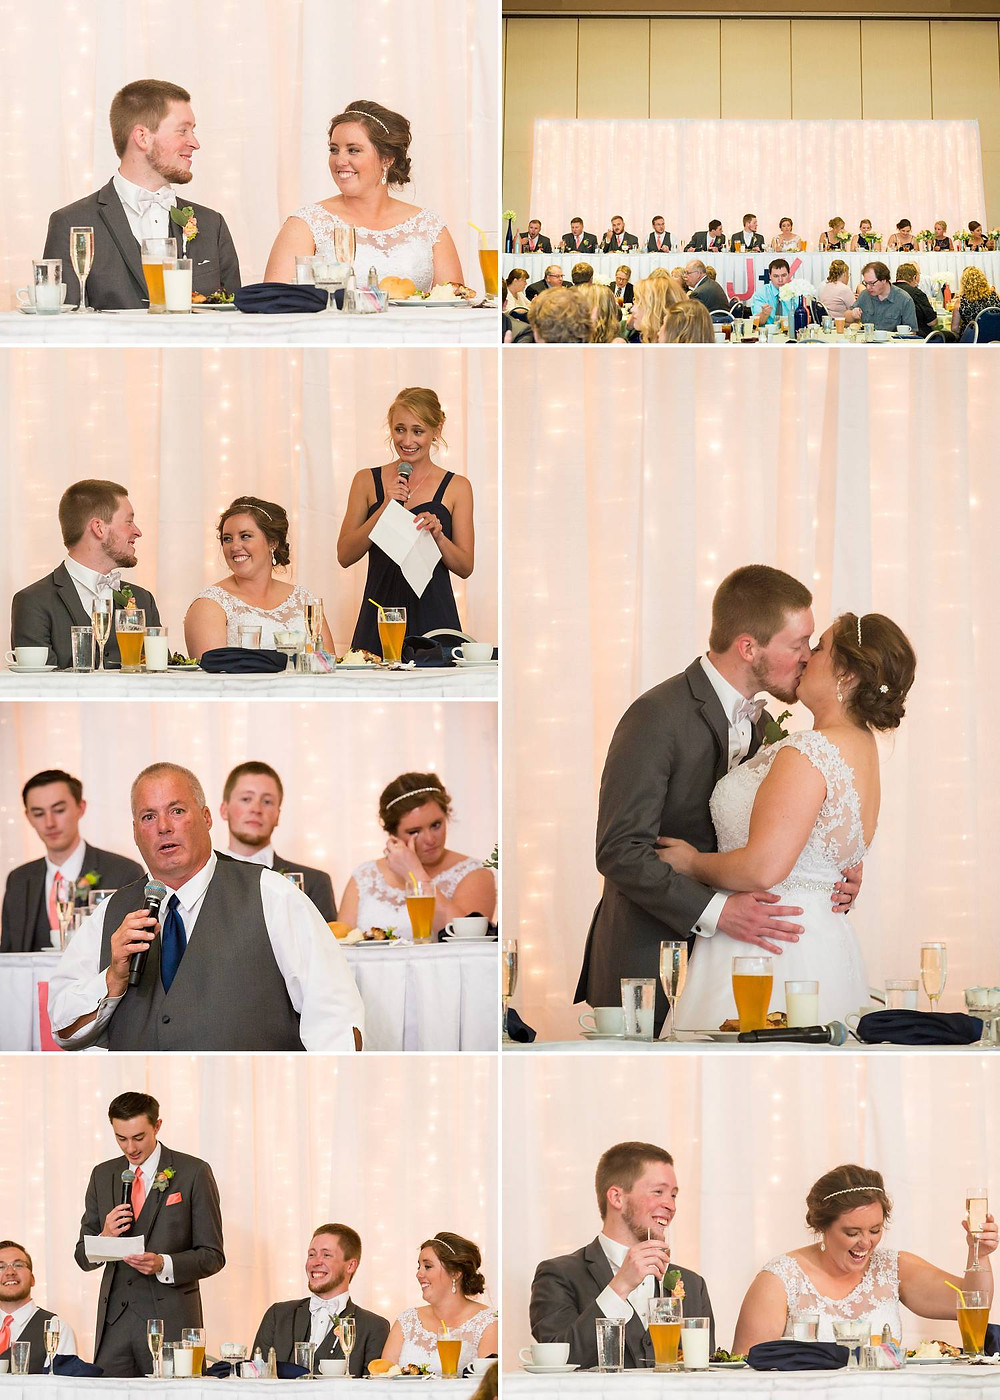 Oshkosh Convention Center Wedding Dinner   Lanari Photography